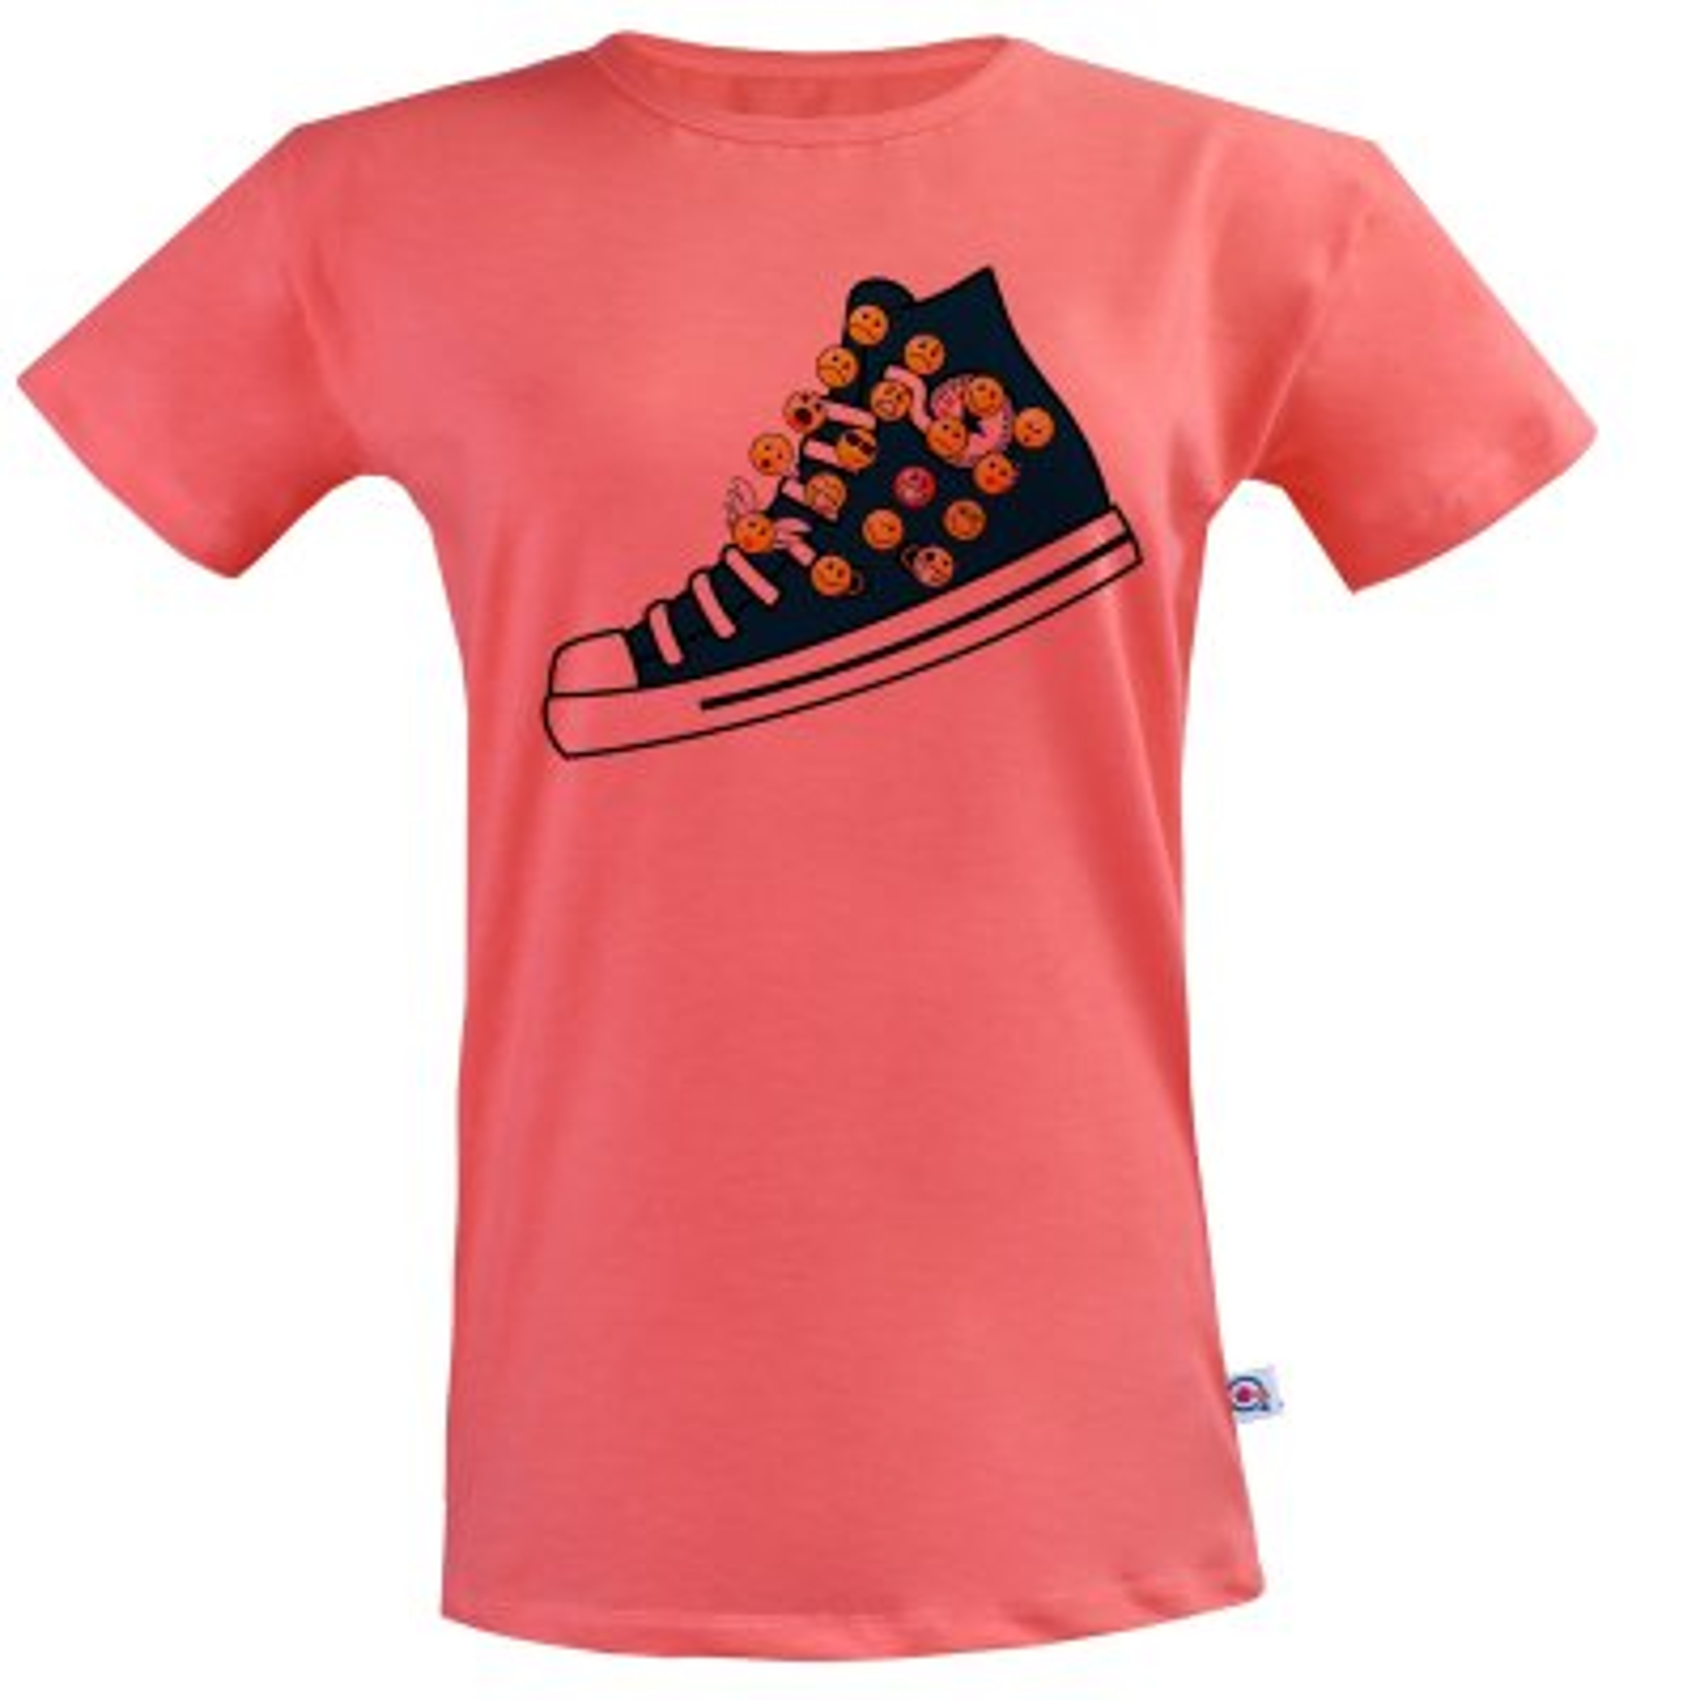 تی شرت زنانه آکو طرح کتونی کد BG87